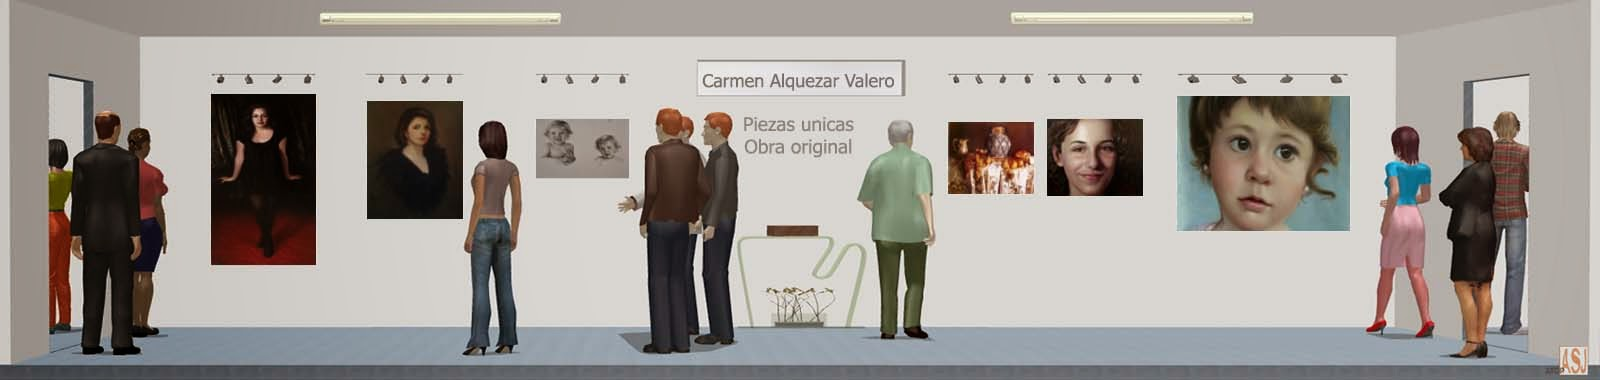 "<img src="" http://3.bp.blogspot.com/-nxaKPFeCpyA/U5ROZVstXKI/AAAAAAAAZX8/6o1ZENjFz2A/s1600/sala_de_exposicion_de_carmen_alquezar_valero.jpg"" alt=""Sala de Exposición virtual de pinturas y retratos de Carmen Alquezar Valero""/>"